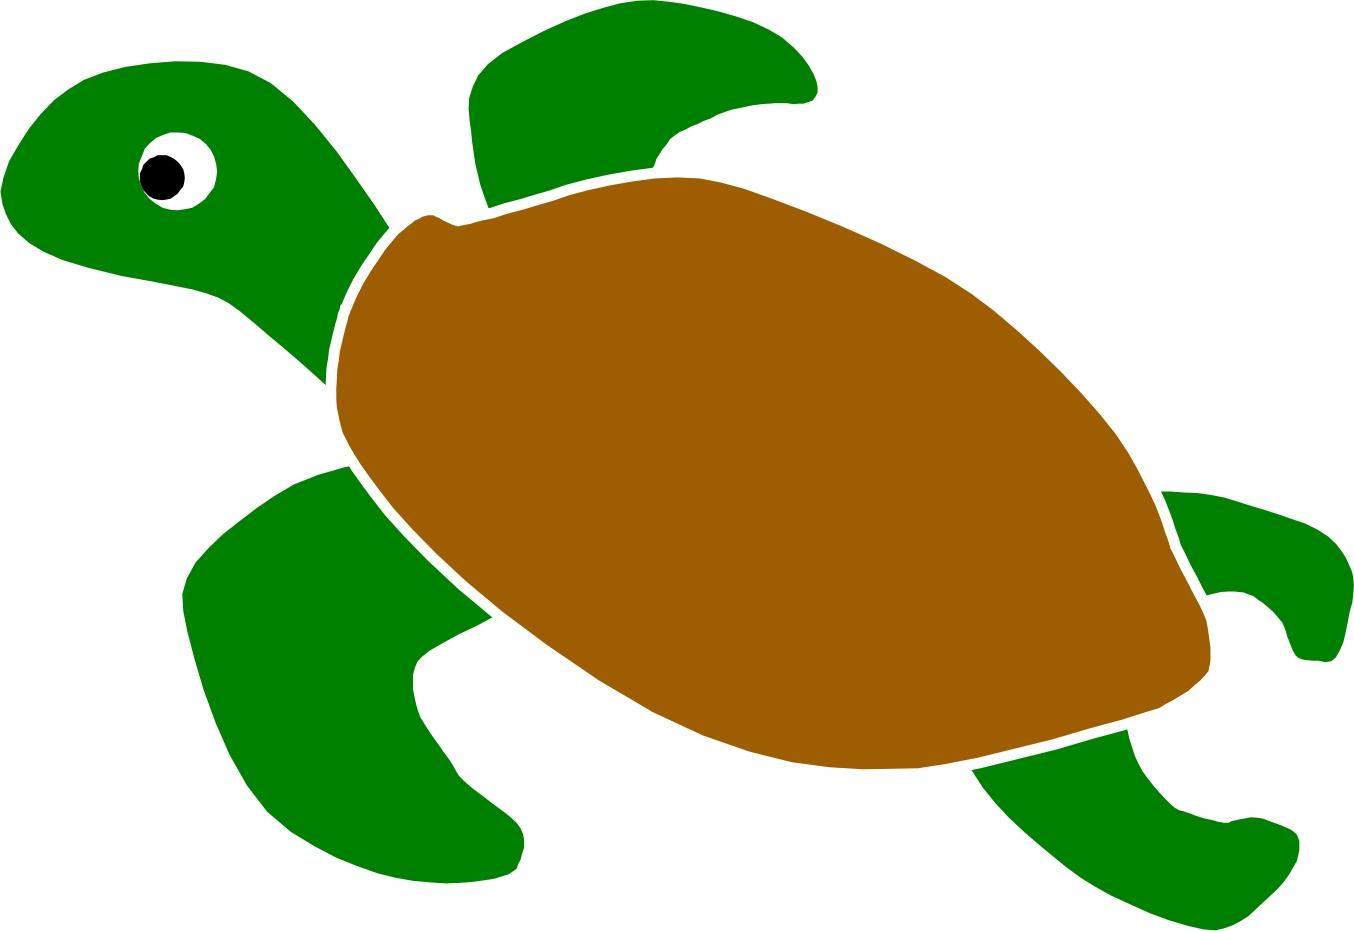 Animated Sea Turtle Wallpaper iPhone - WallpaperSafari